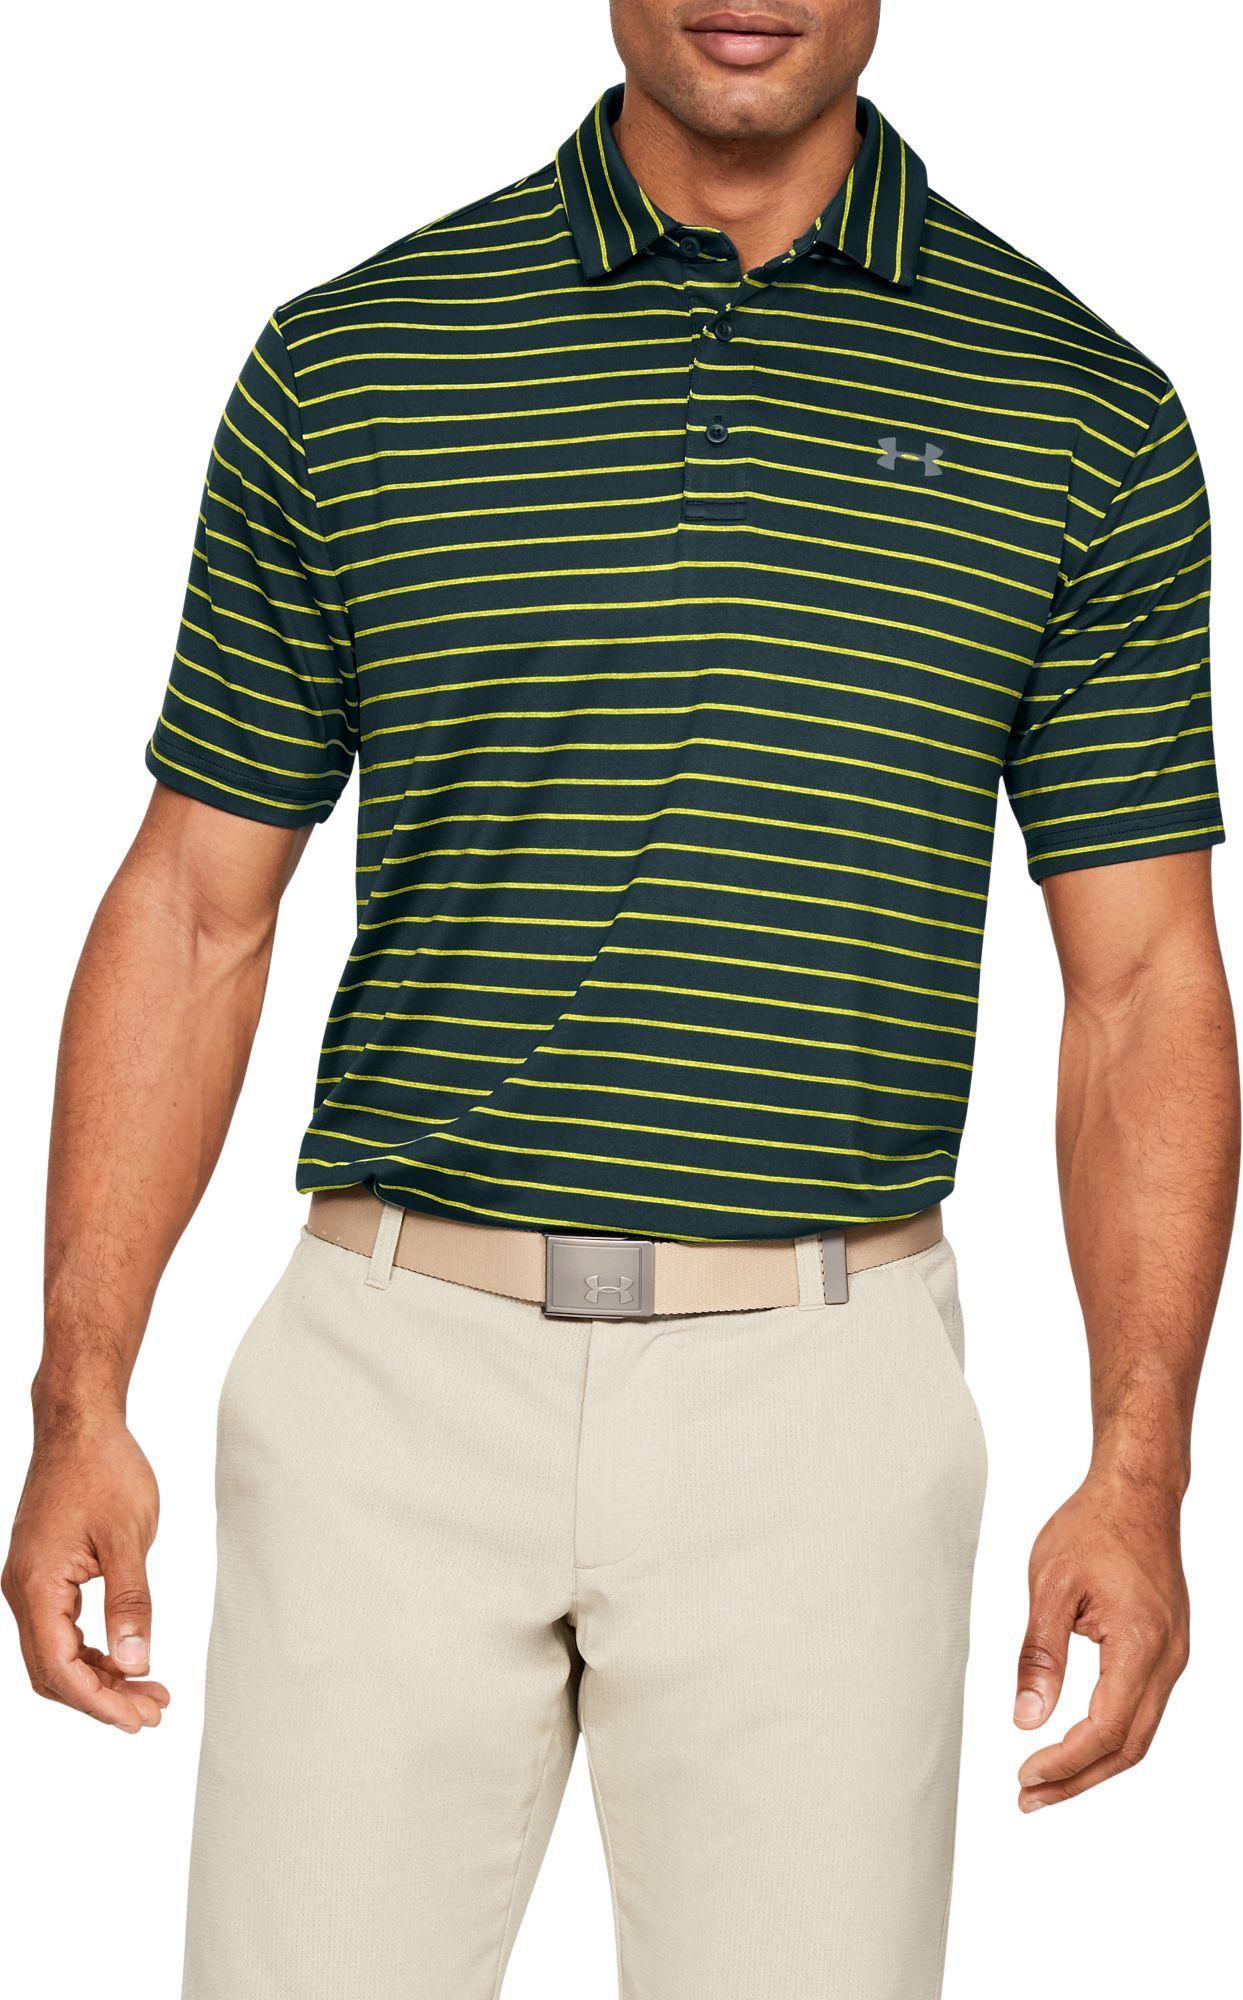 8e1e66aec Under Armour Men's Playoff 2.0 Tour Stripe Golf Polo, Size: Small ...